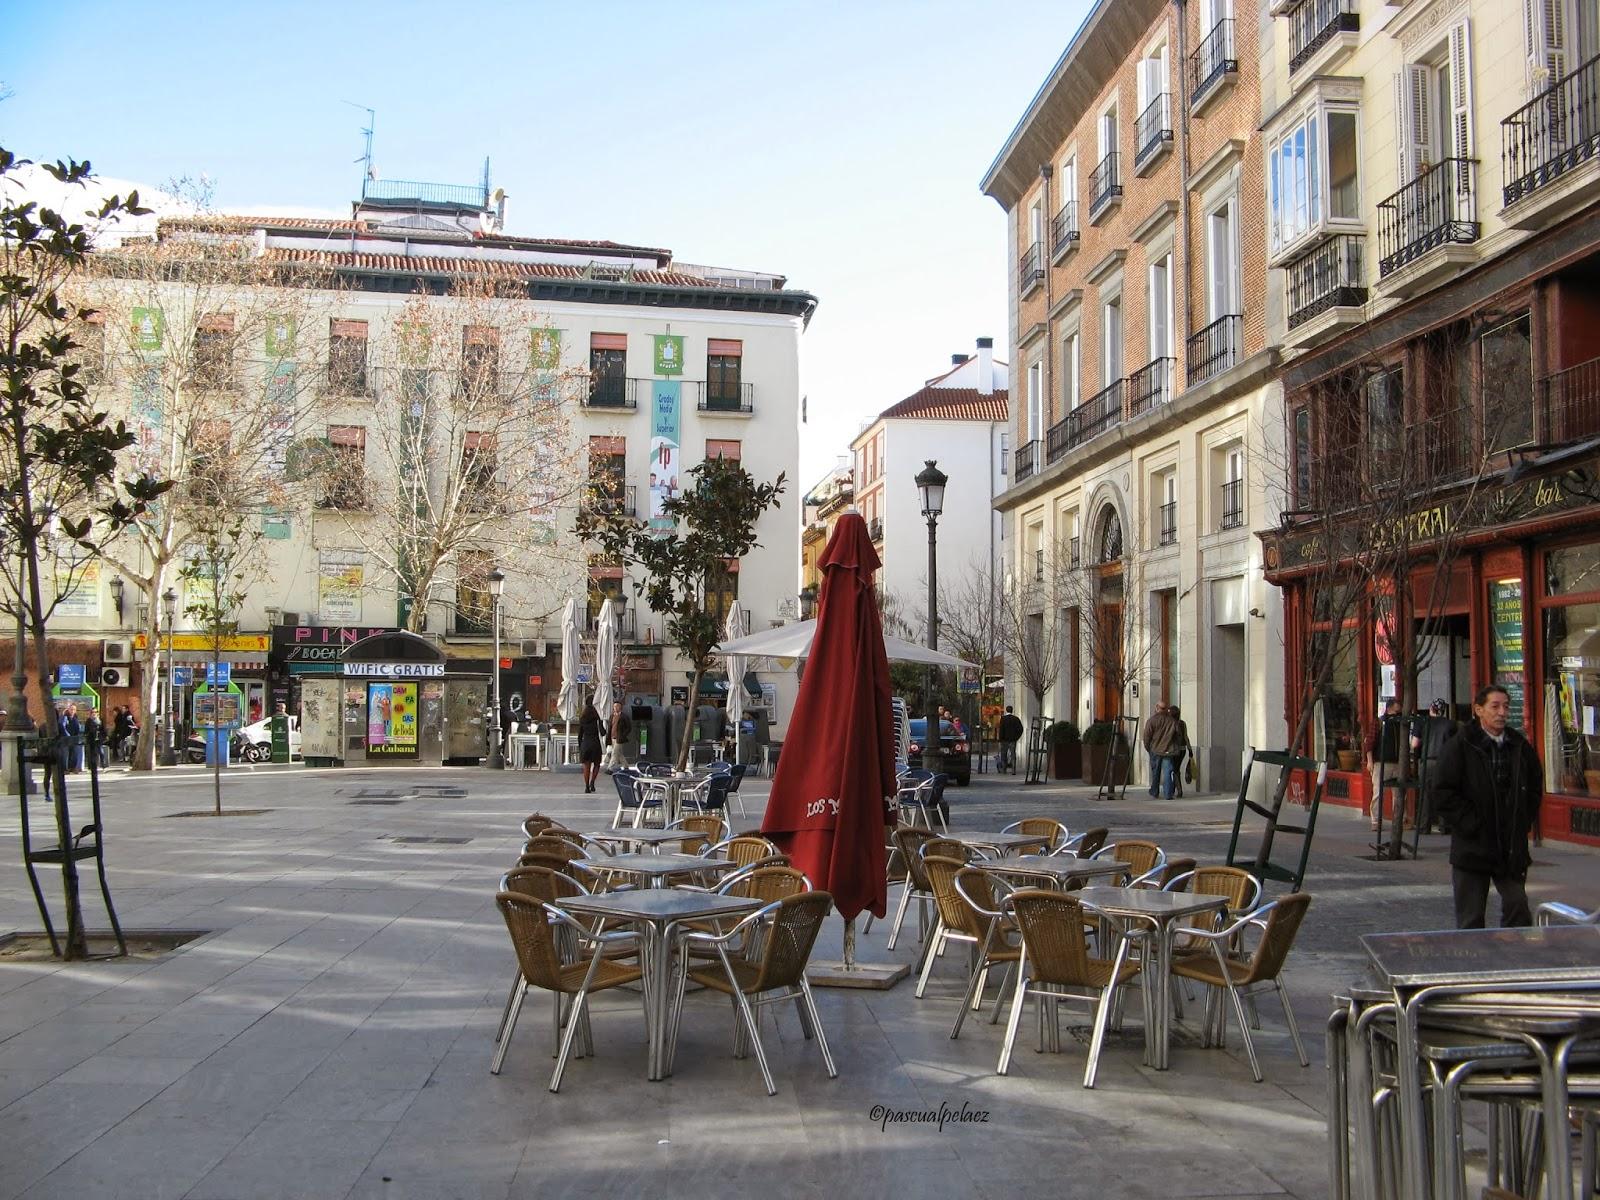 Rincones ibericos madrid plaza del ngel espa a for Discoteca plaza de los cubos madrid